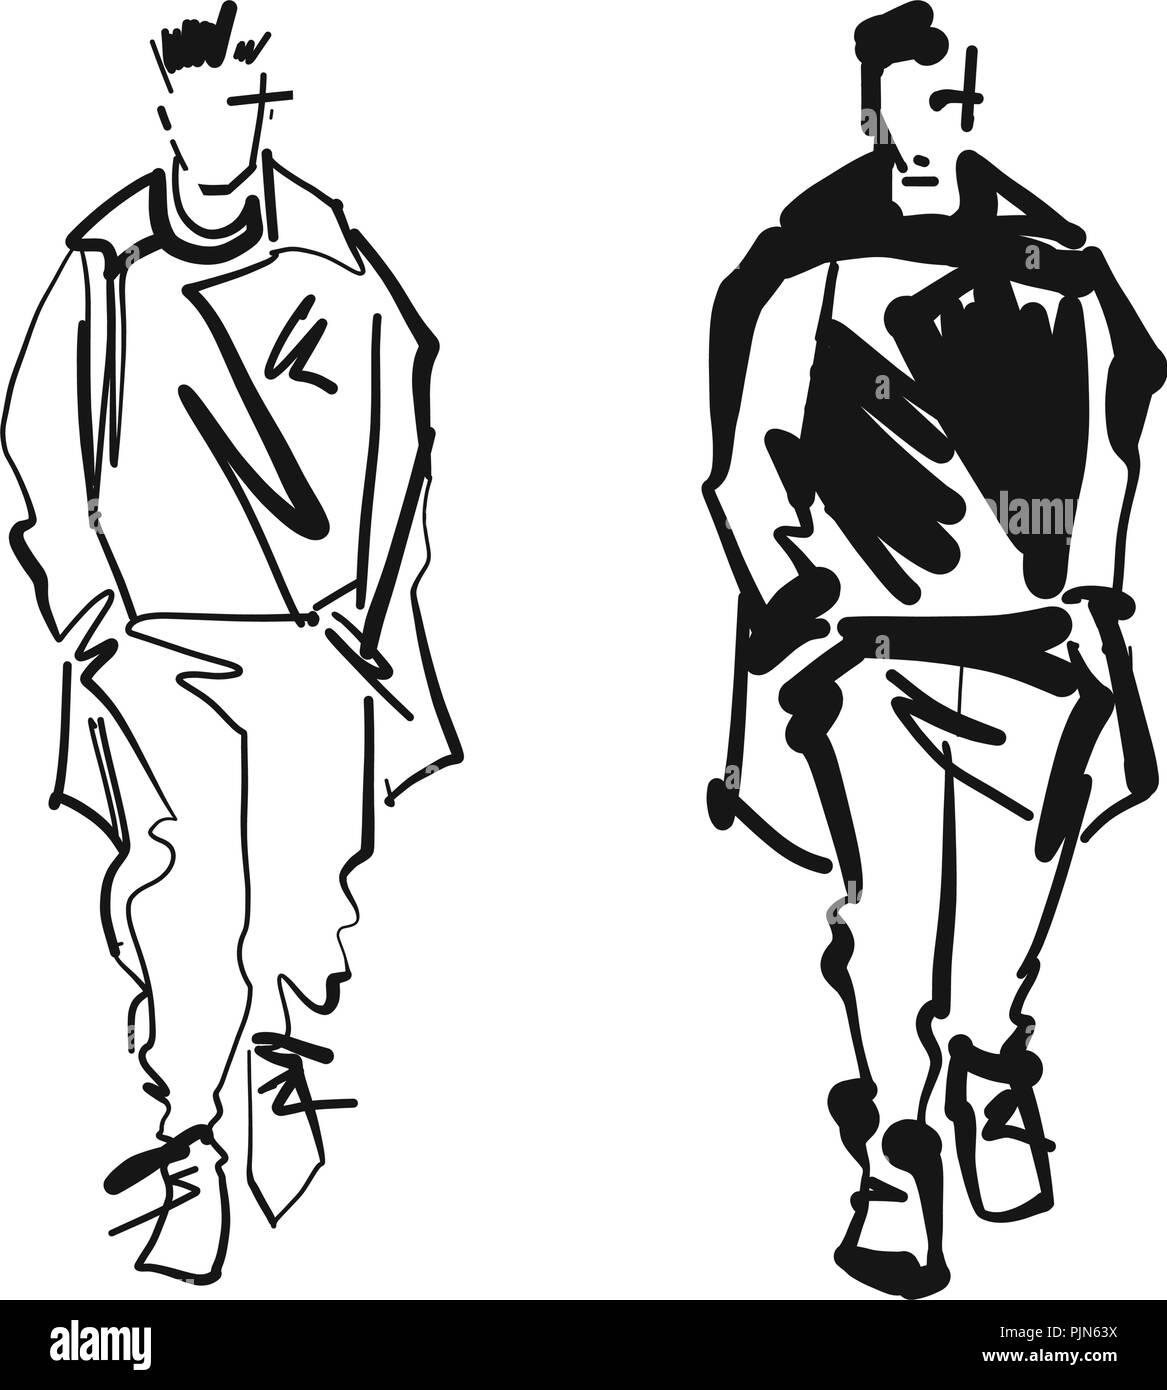 c0d512f7 Fashion man model silhouettes hand drawn. Monochrome vector. Male fashion  illustration .